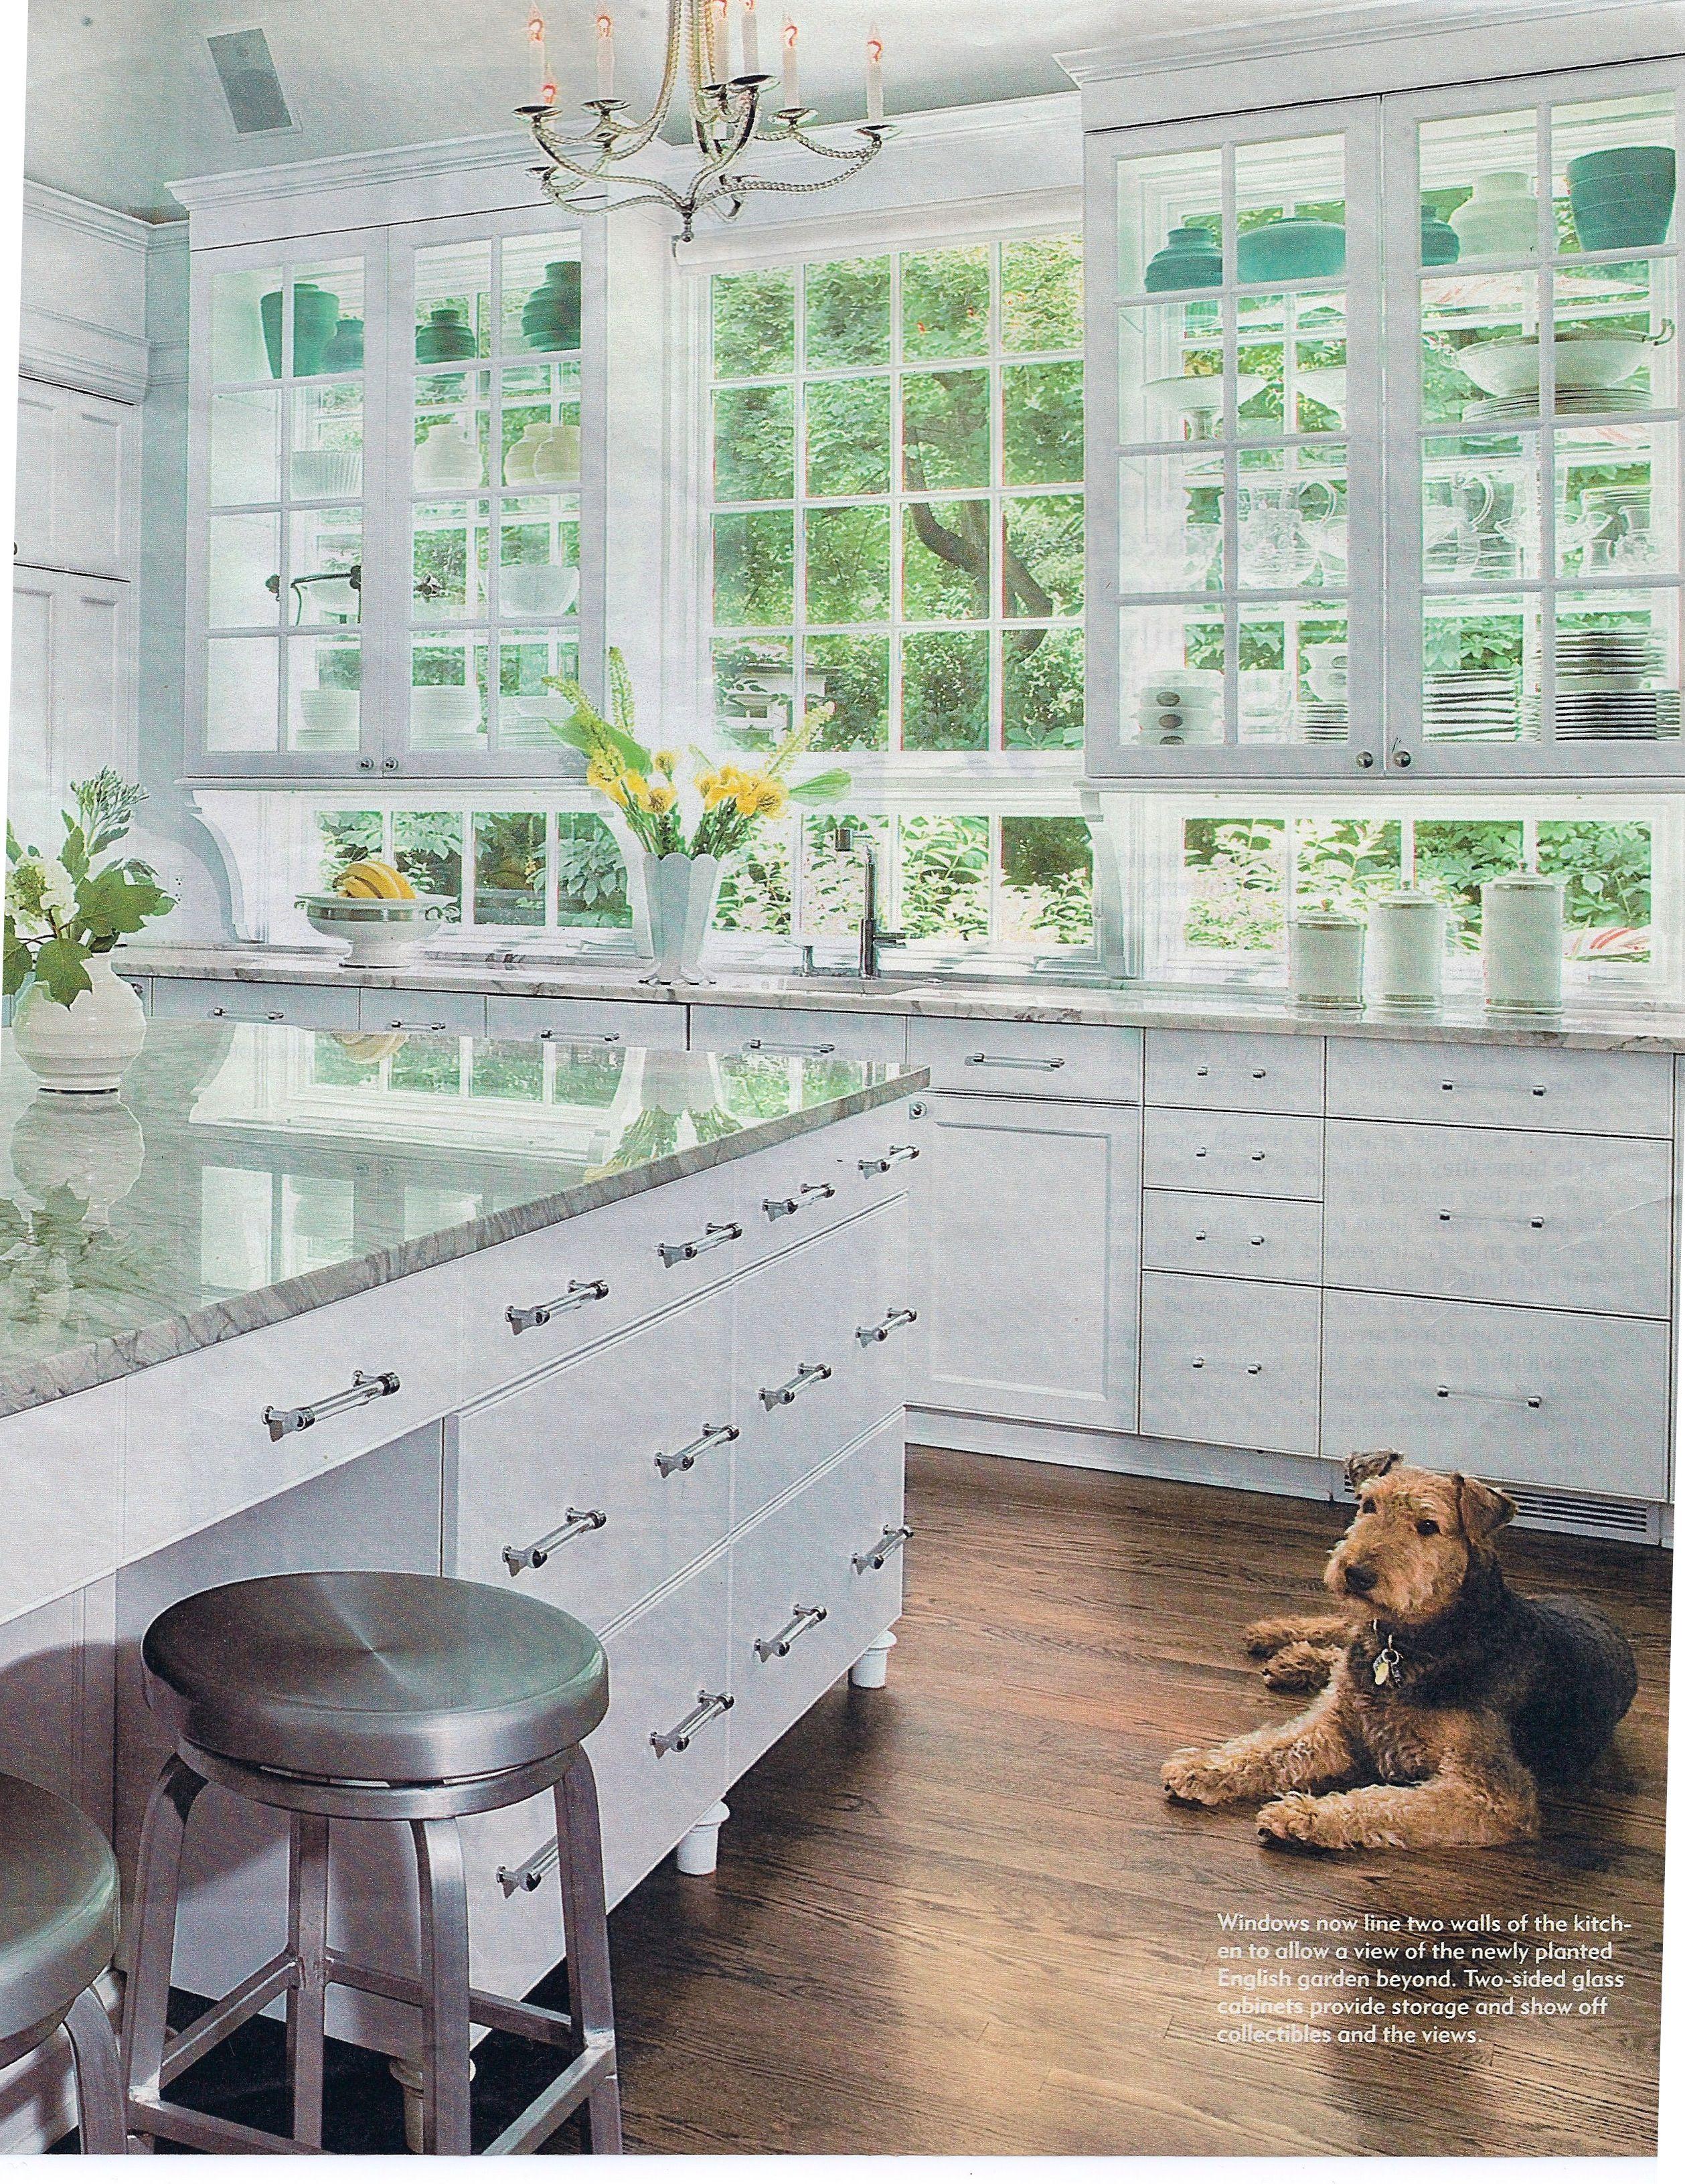 Window kitchen cabinets  glass kitchen display cabinets over windows  konyha  pinterest